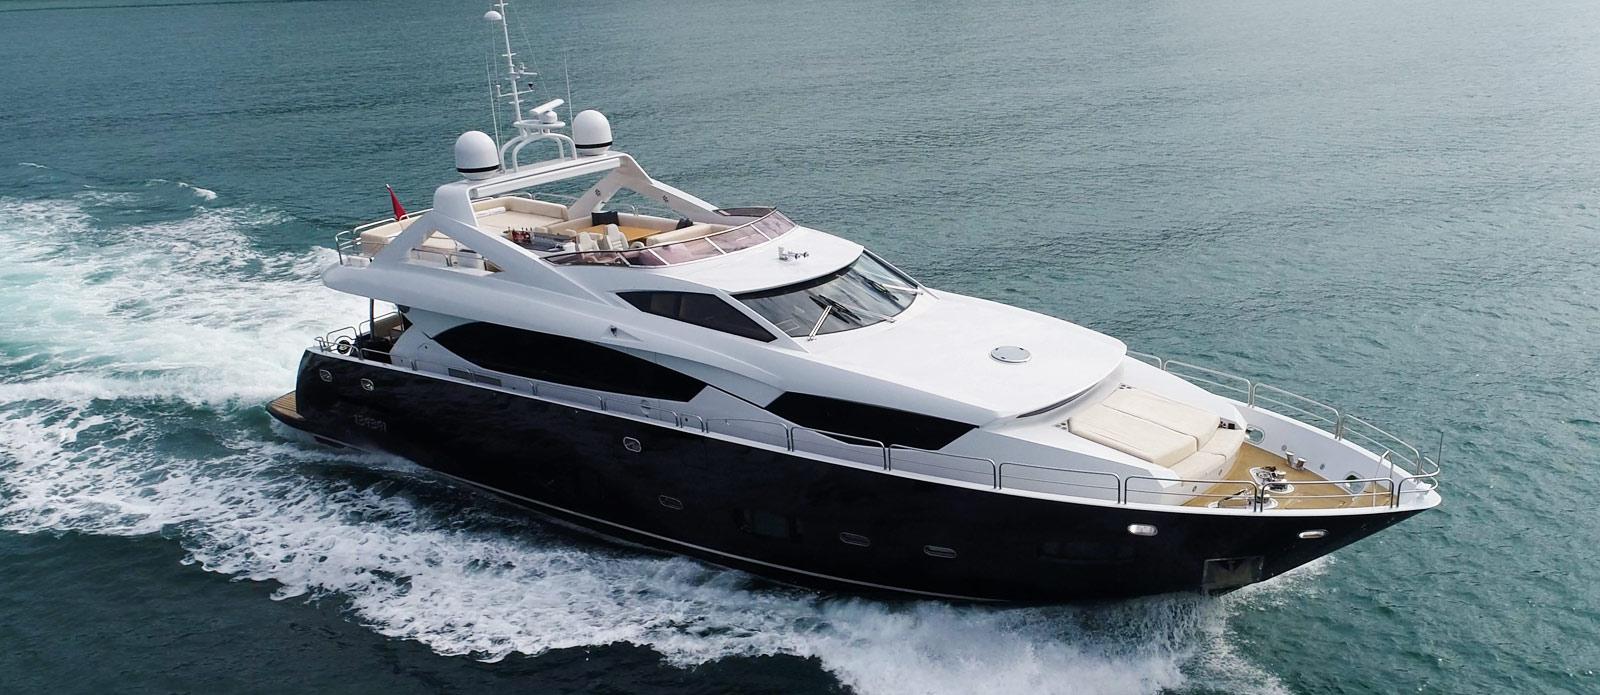 Sunseeker-30-Metre-Yacht-Coraysa-Cruising-Overhead